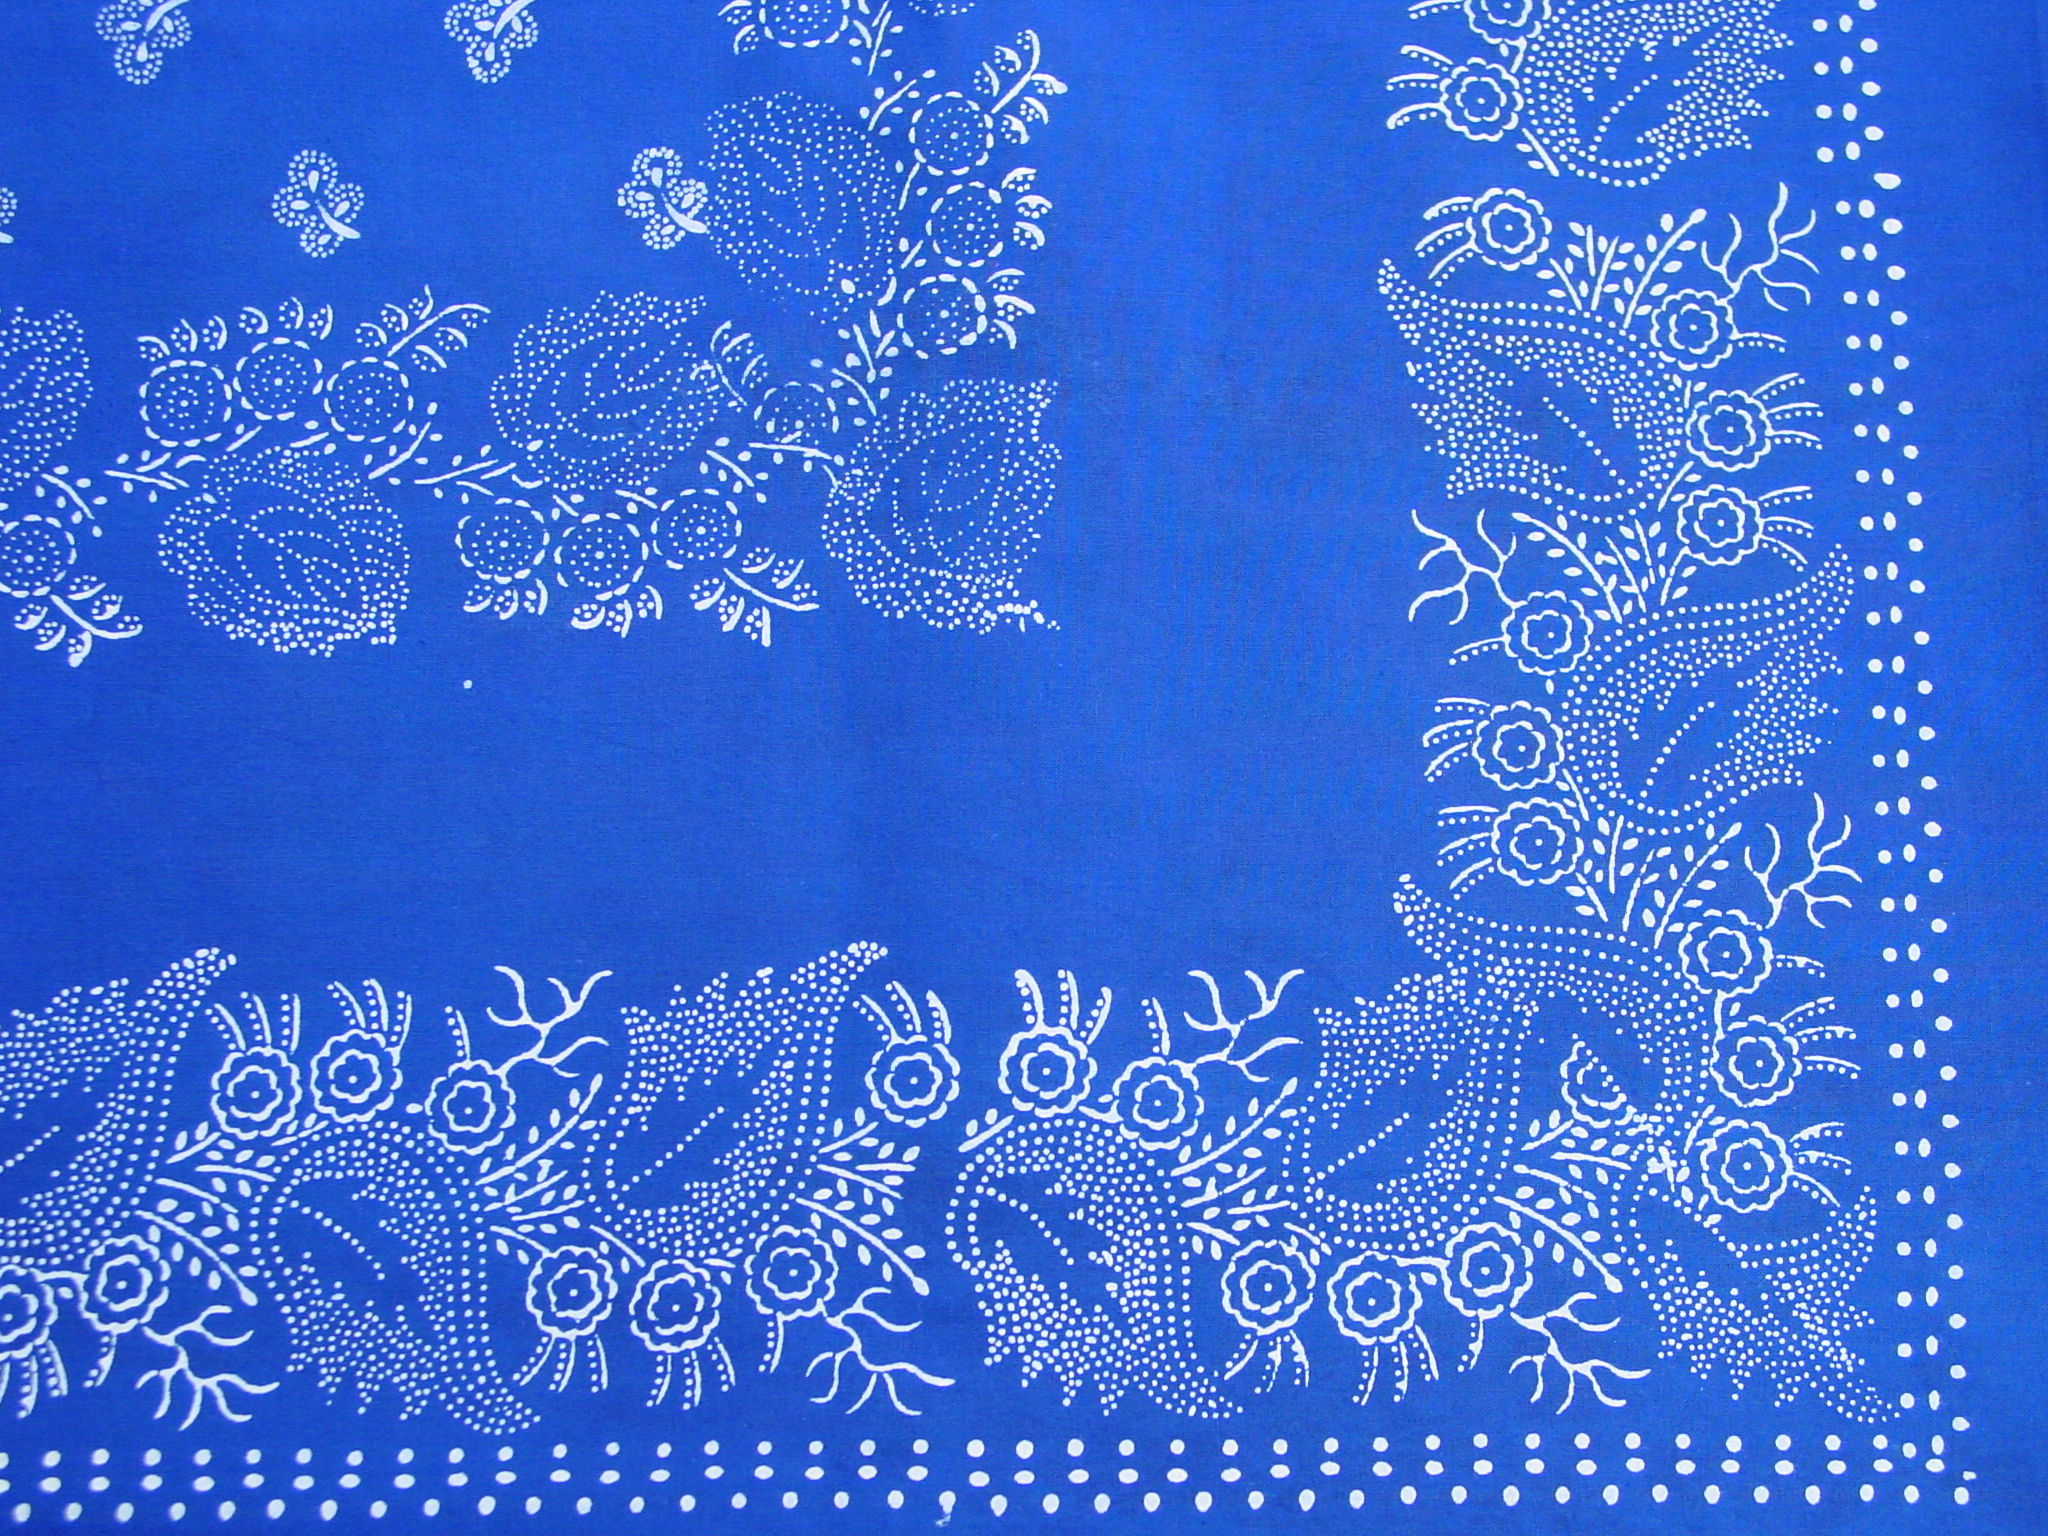 Große Blaudruck-Tischdecke 6485-1304